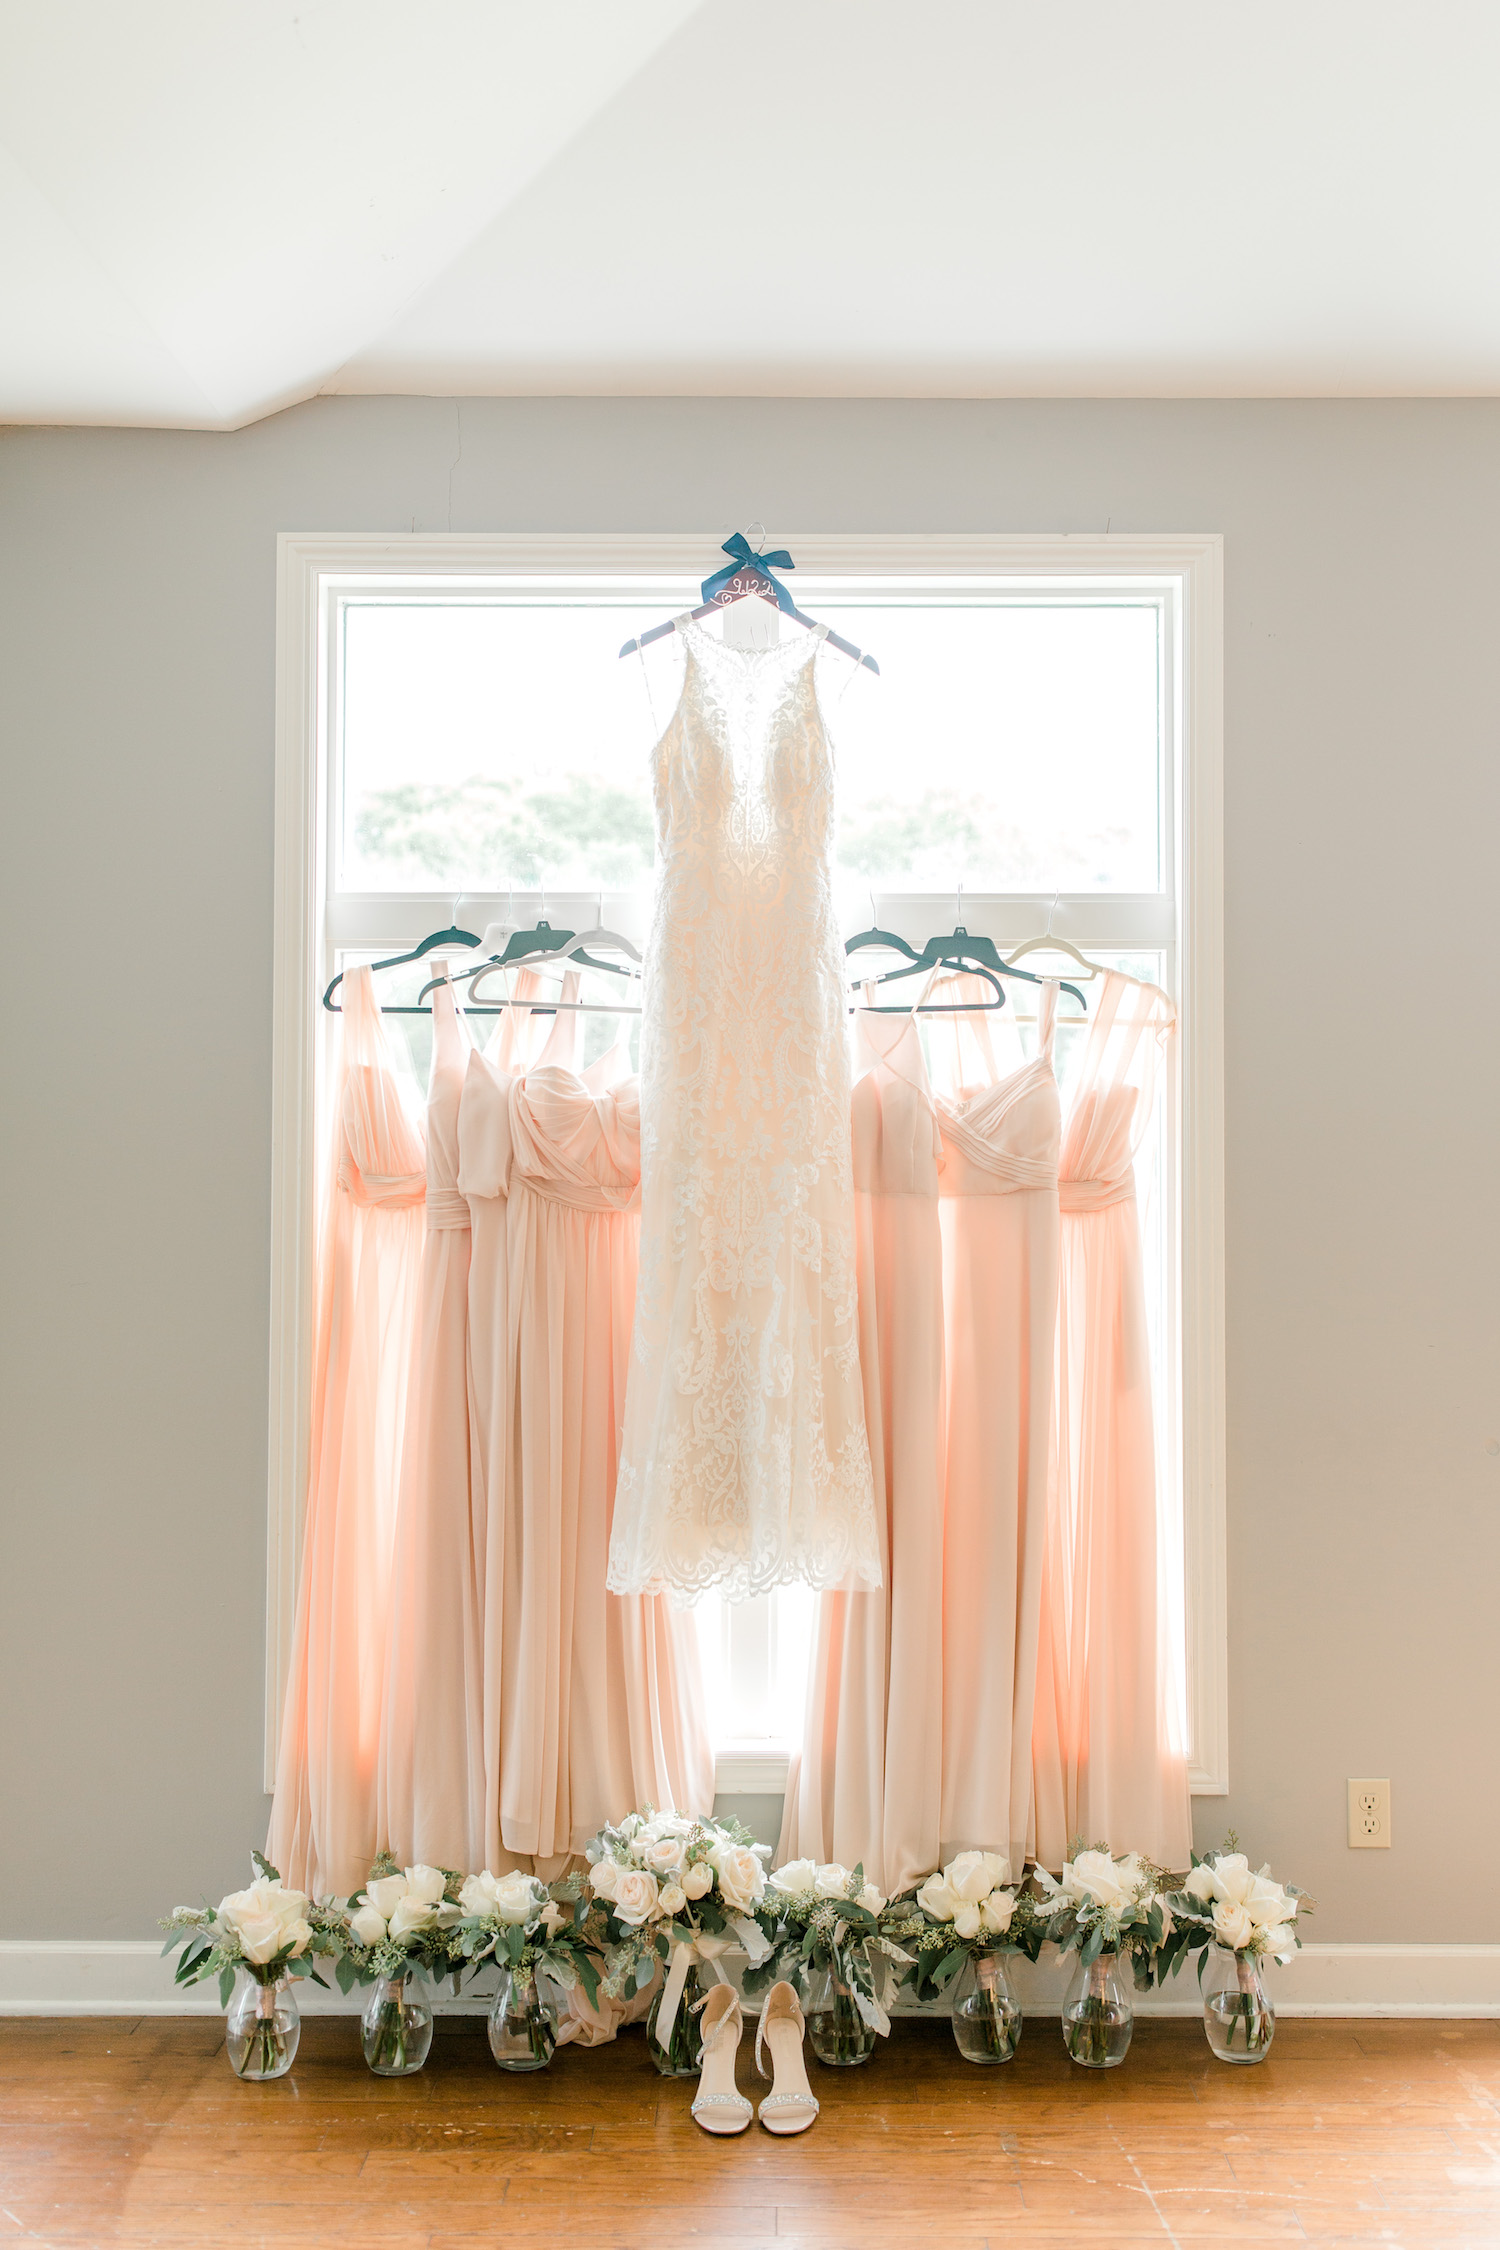 Brides dress hanging with bridesmaids dresses